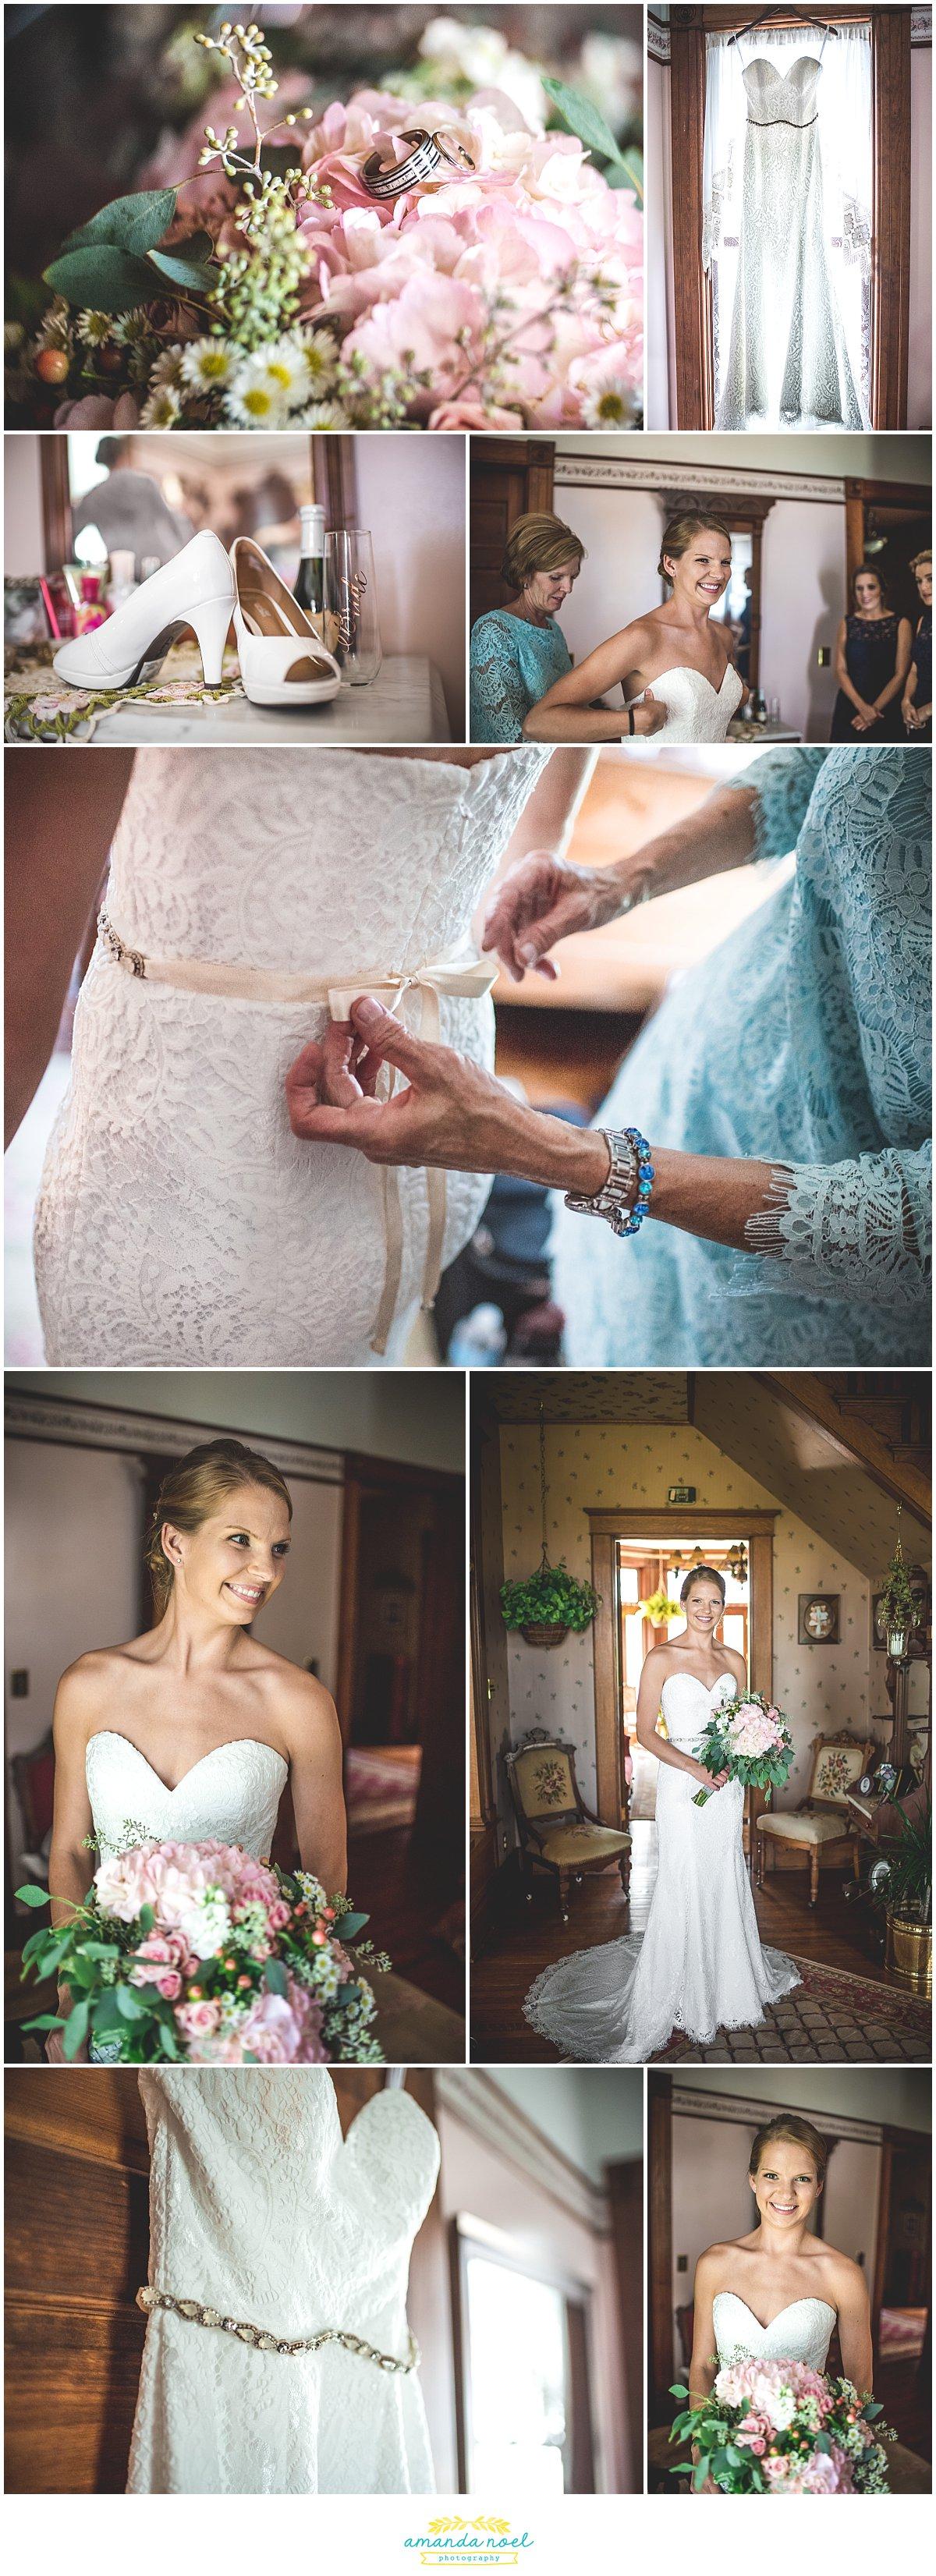 ohio bride getting ready